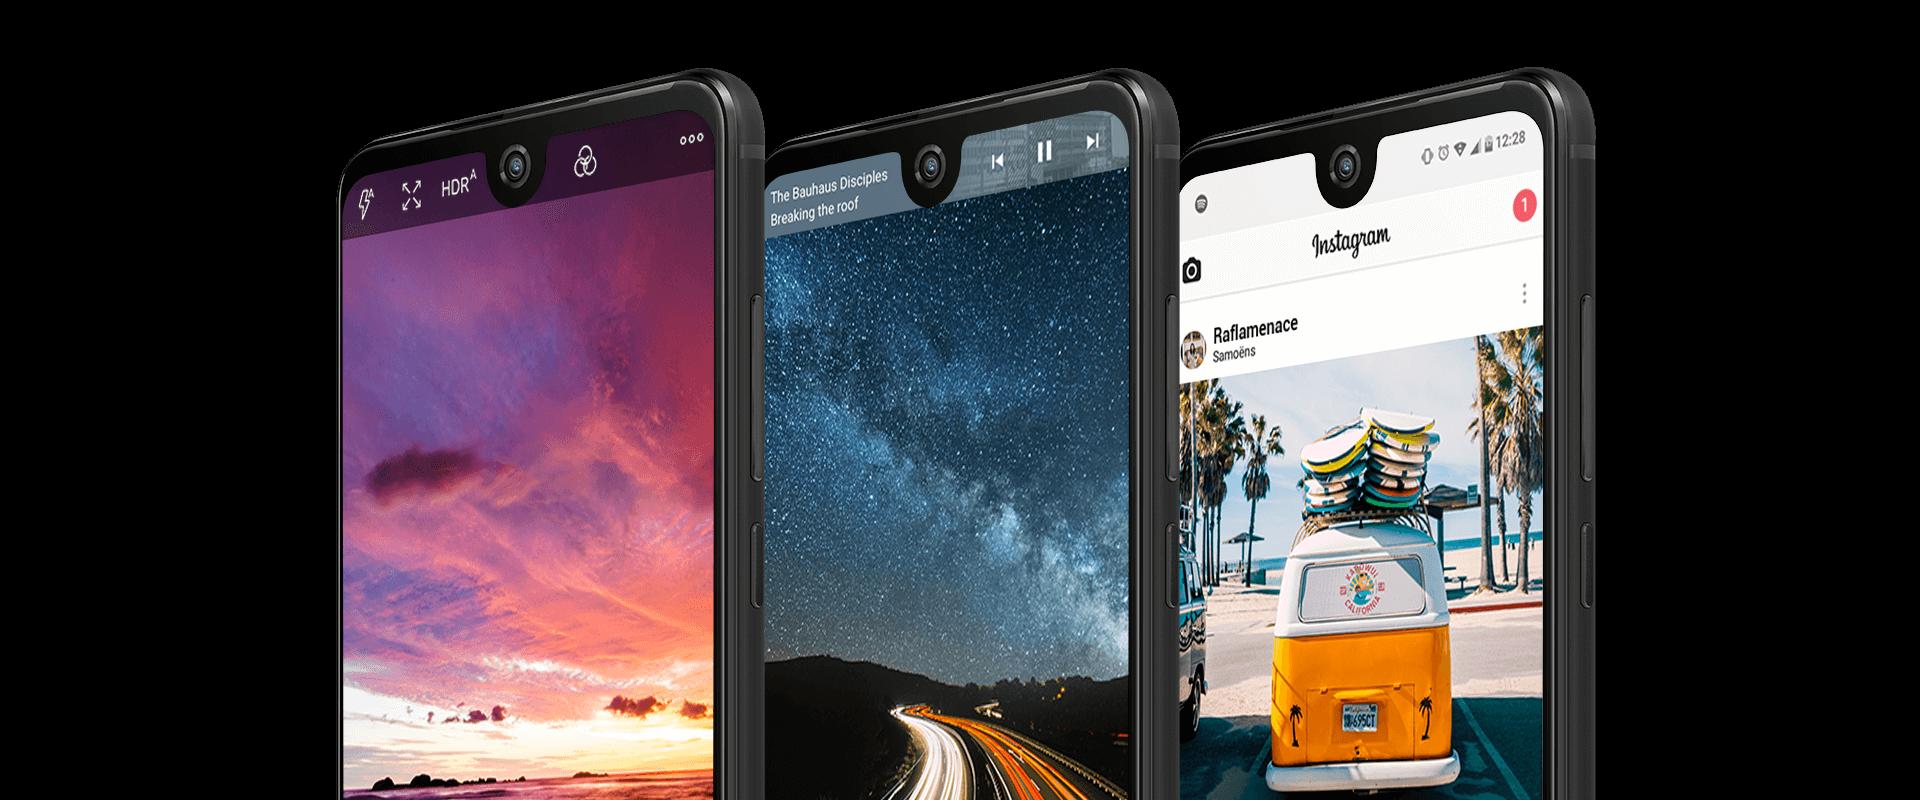 Smartphone Wiko View2 Pro - Wiko Mobile Algérie 2018